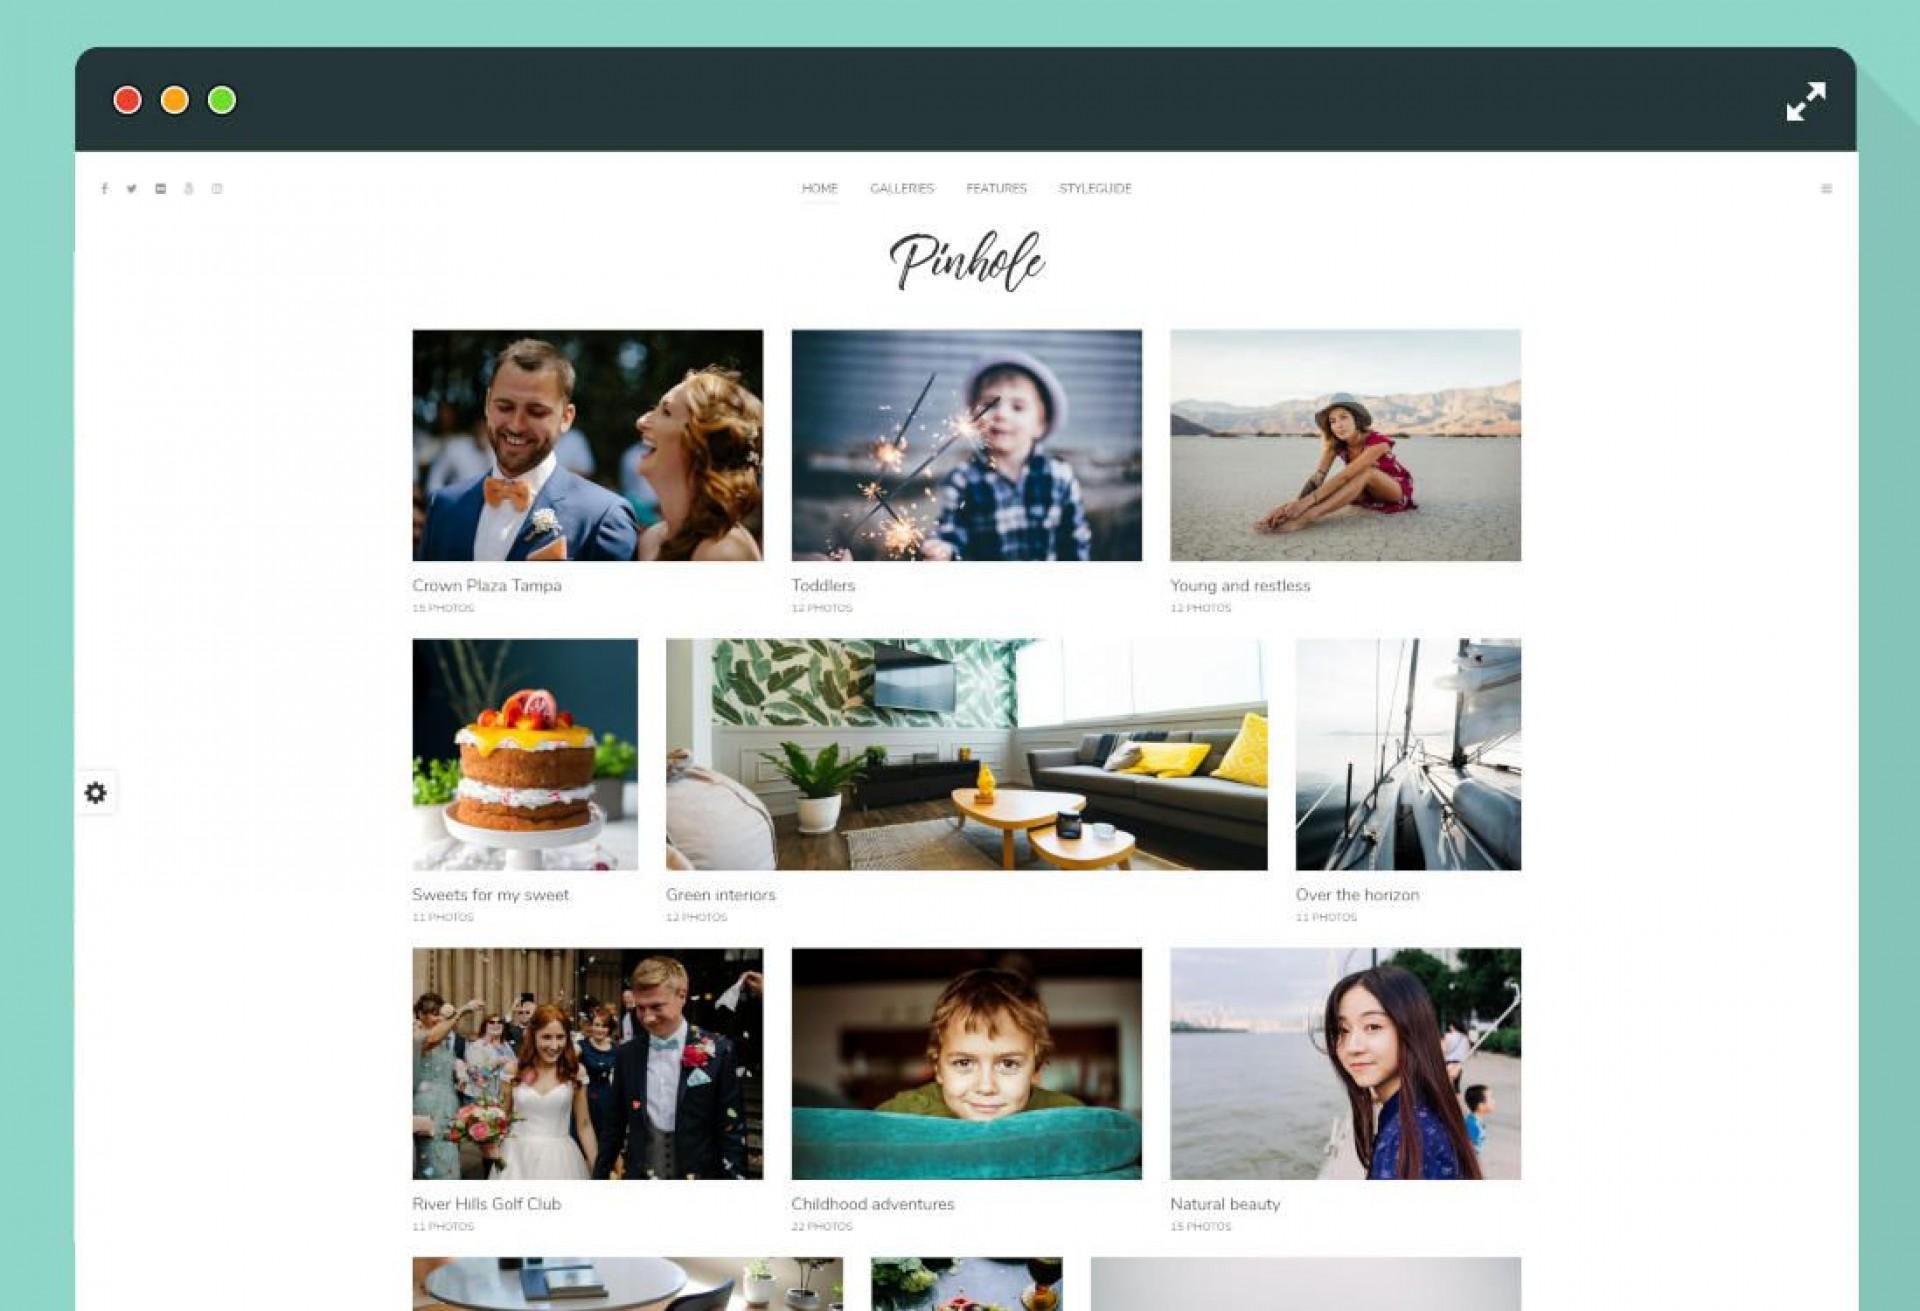 008 Surprising Website Template For Photographer Image  Photographers Free Responsive Photography Php Best1920